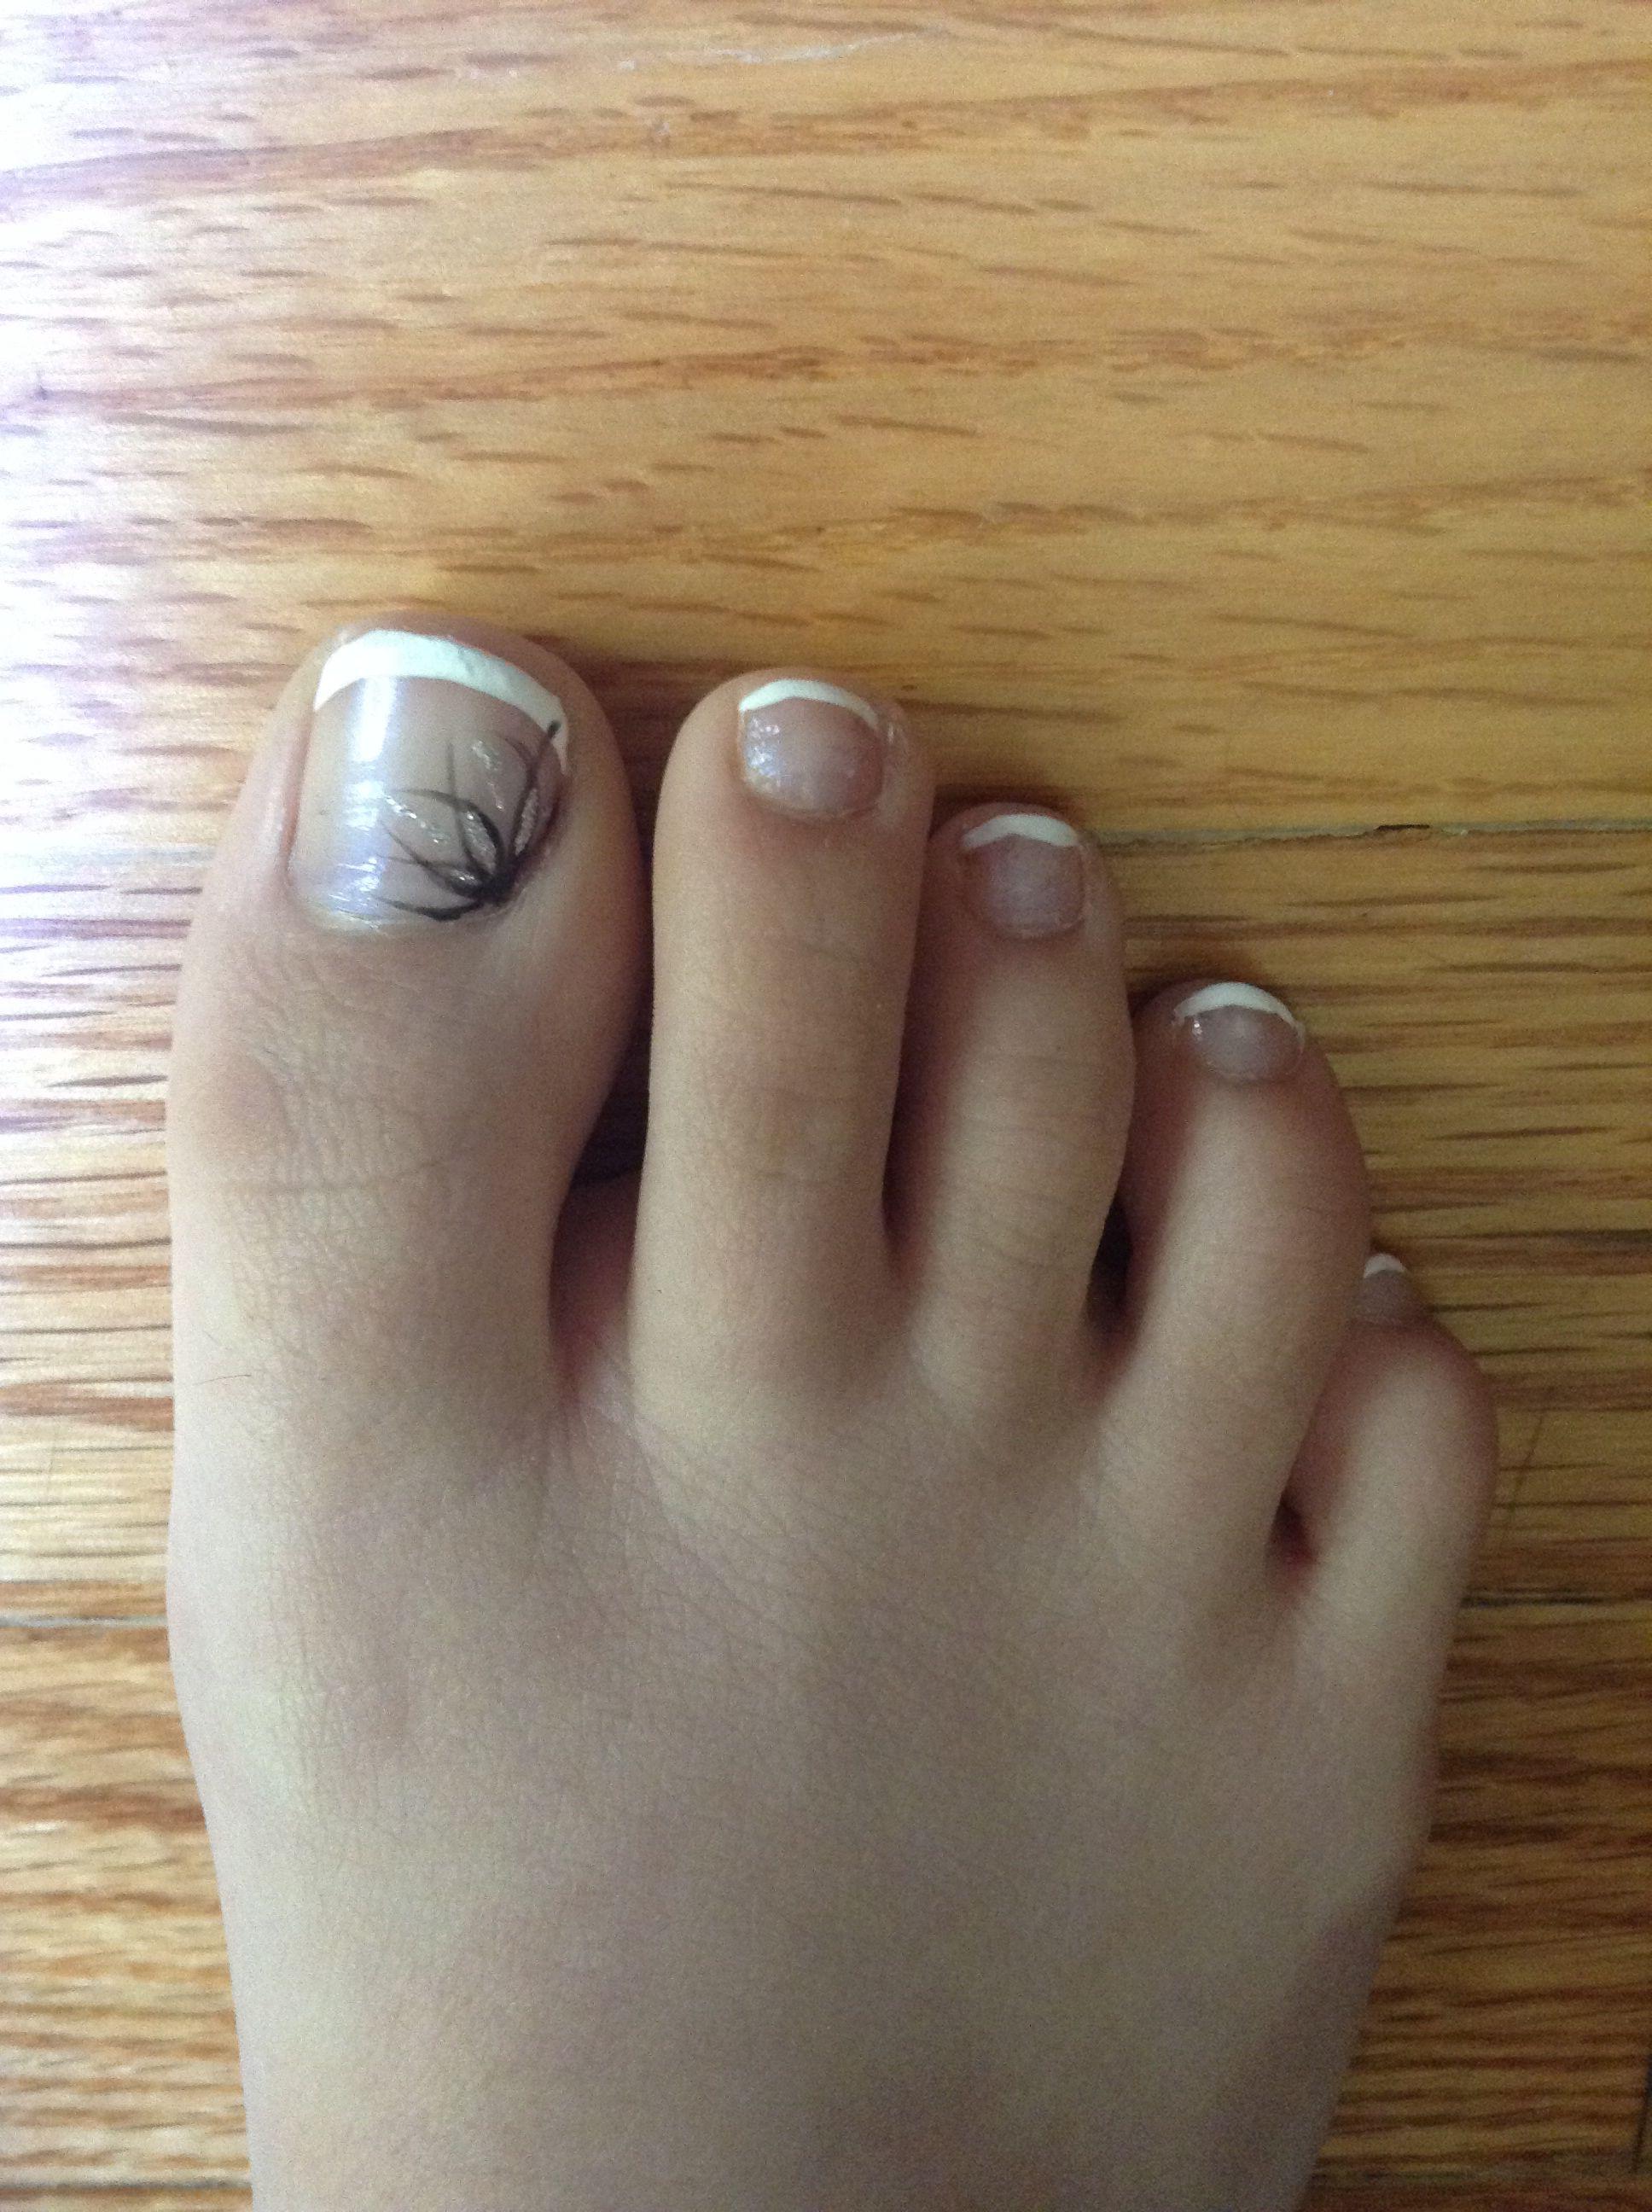 Simple toe nail design   Beauty/nails   Pinterest   Simple toe nails ...